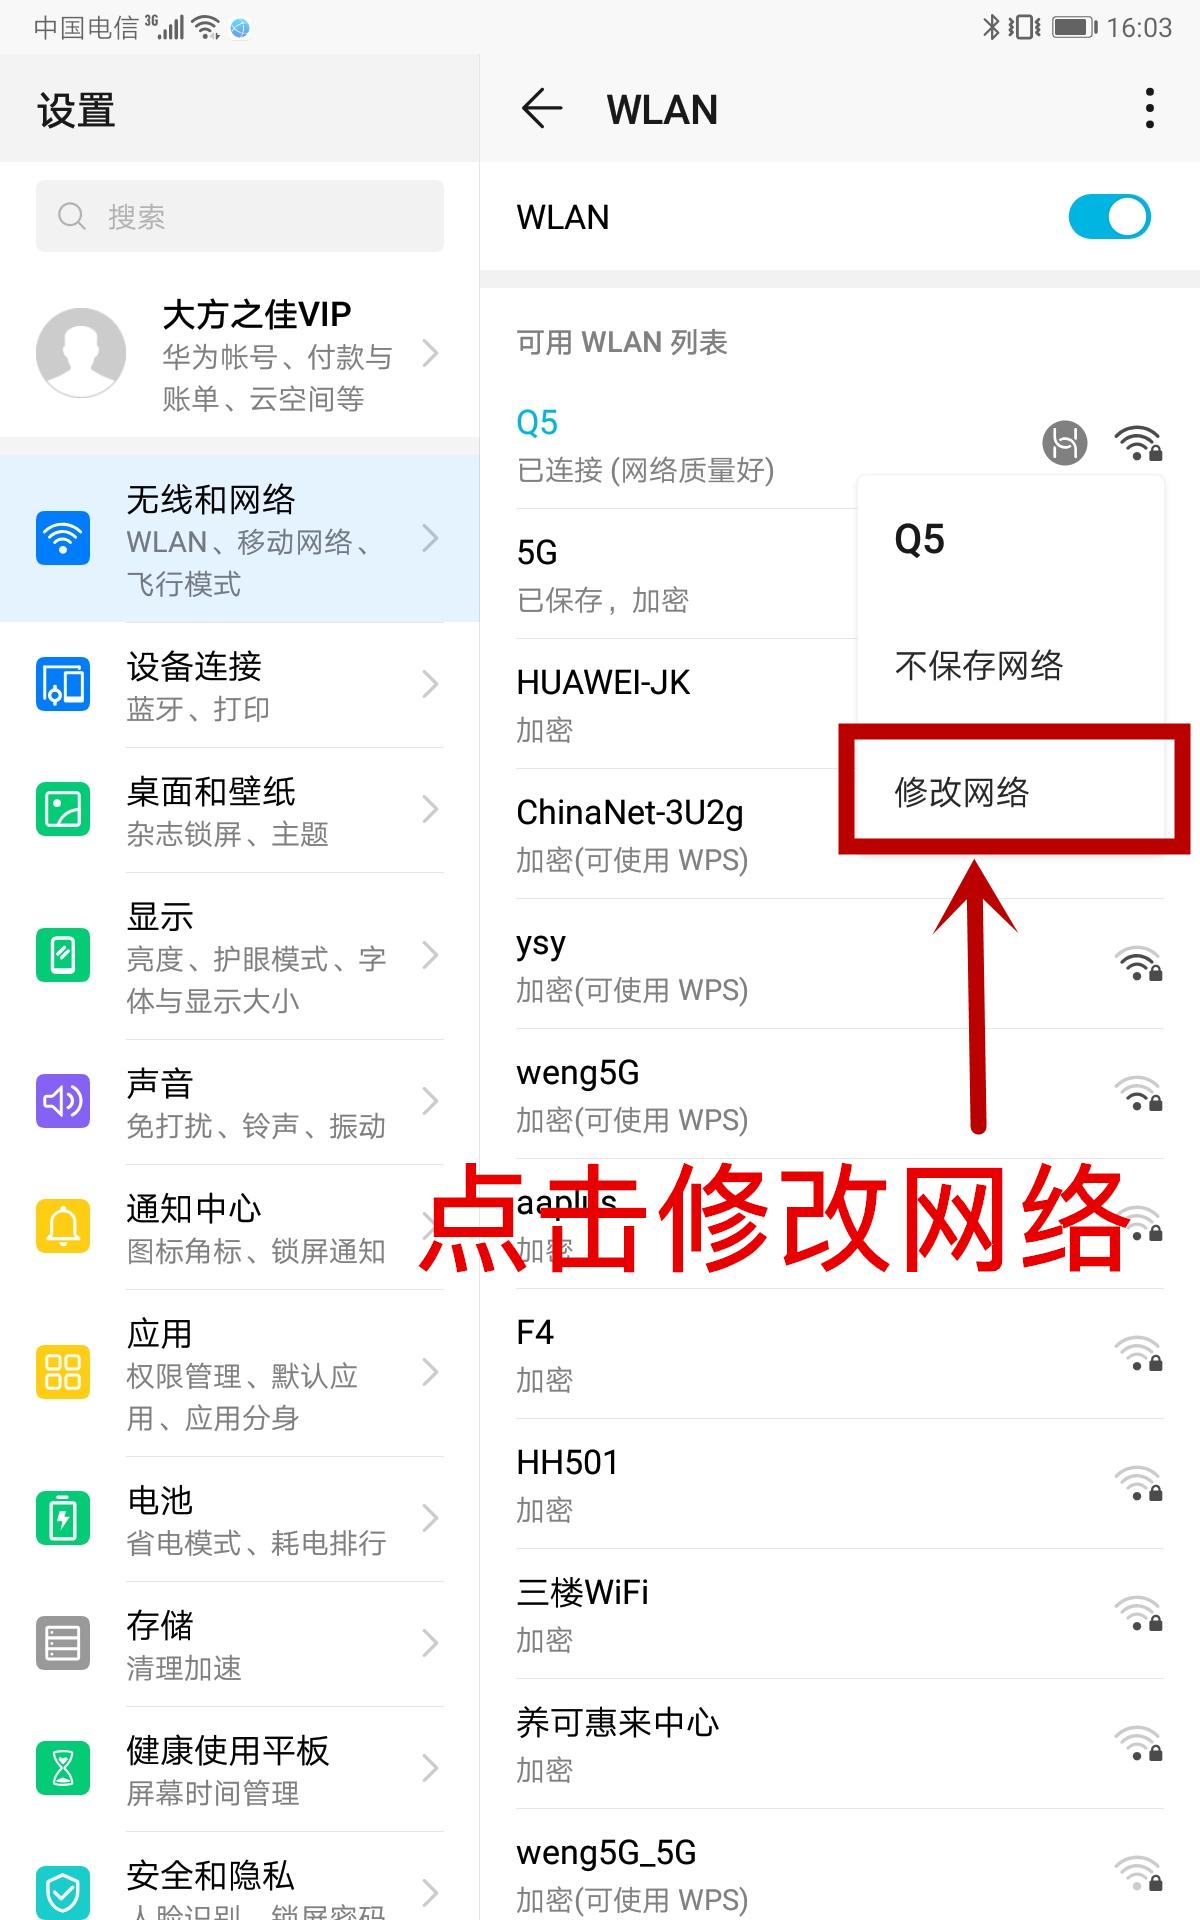 Screenshot_20190416_160314_com.android.settings.jpg